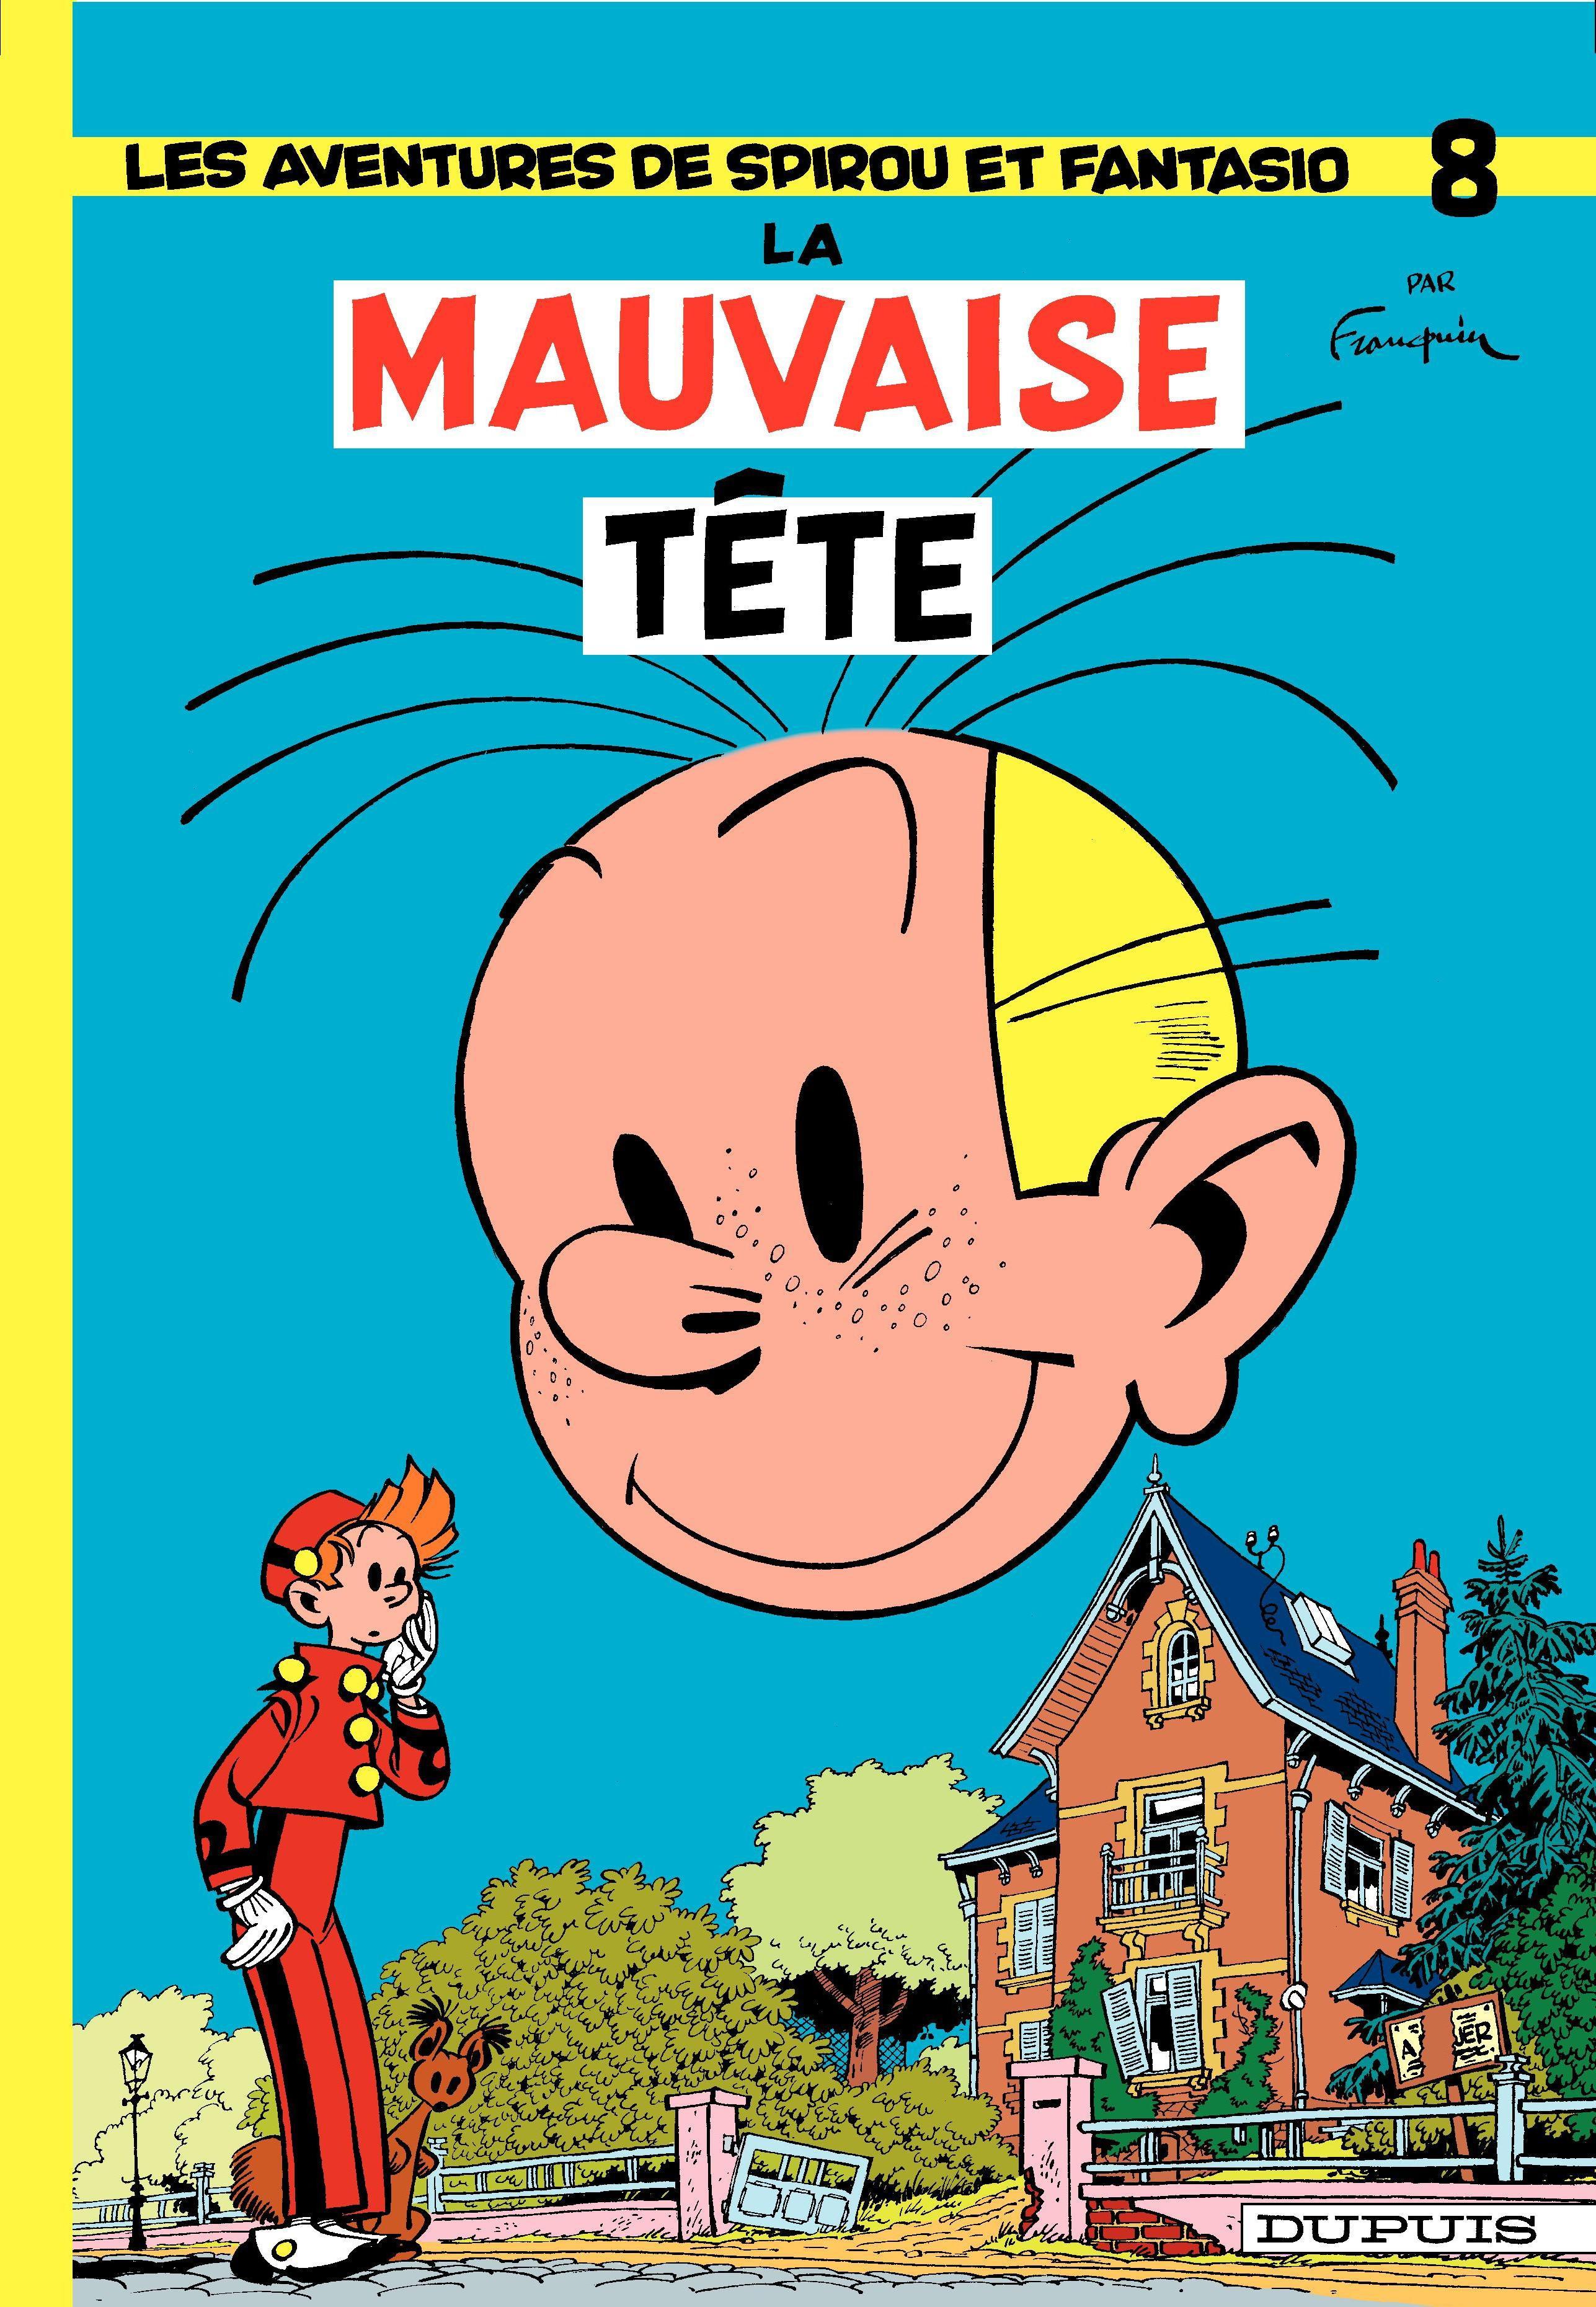 Spirou et Fantasio - Tome 8 - LA MAUVAISE TETE